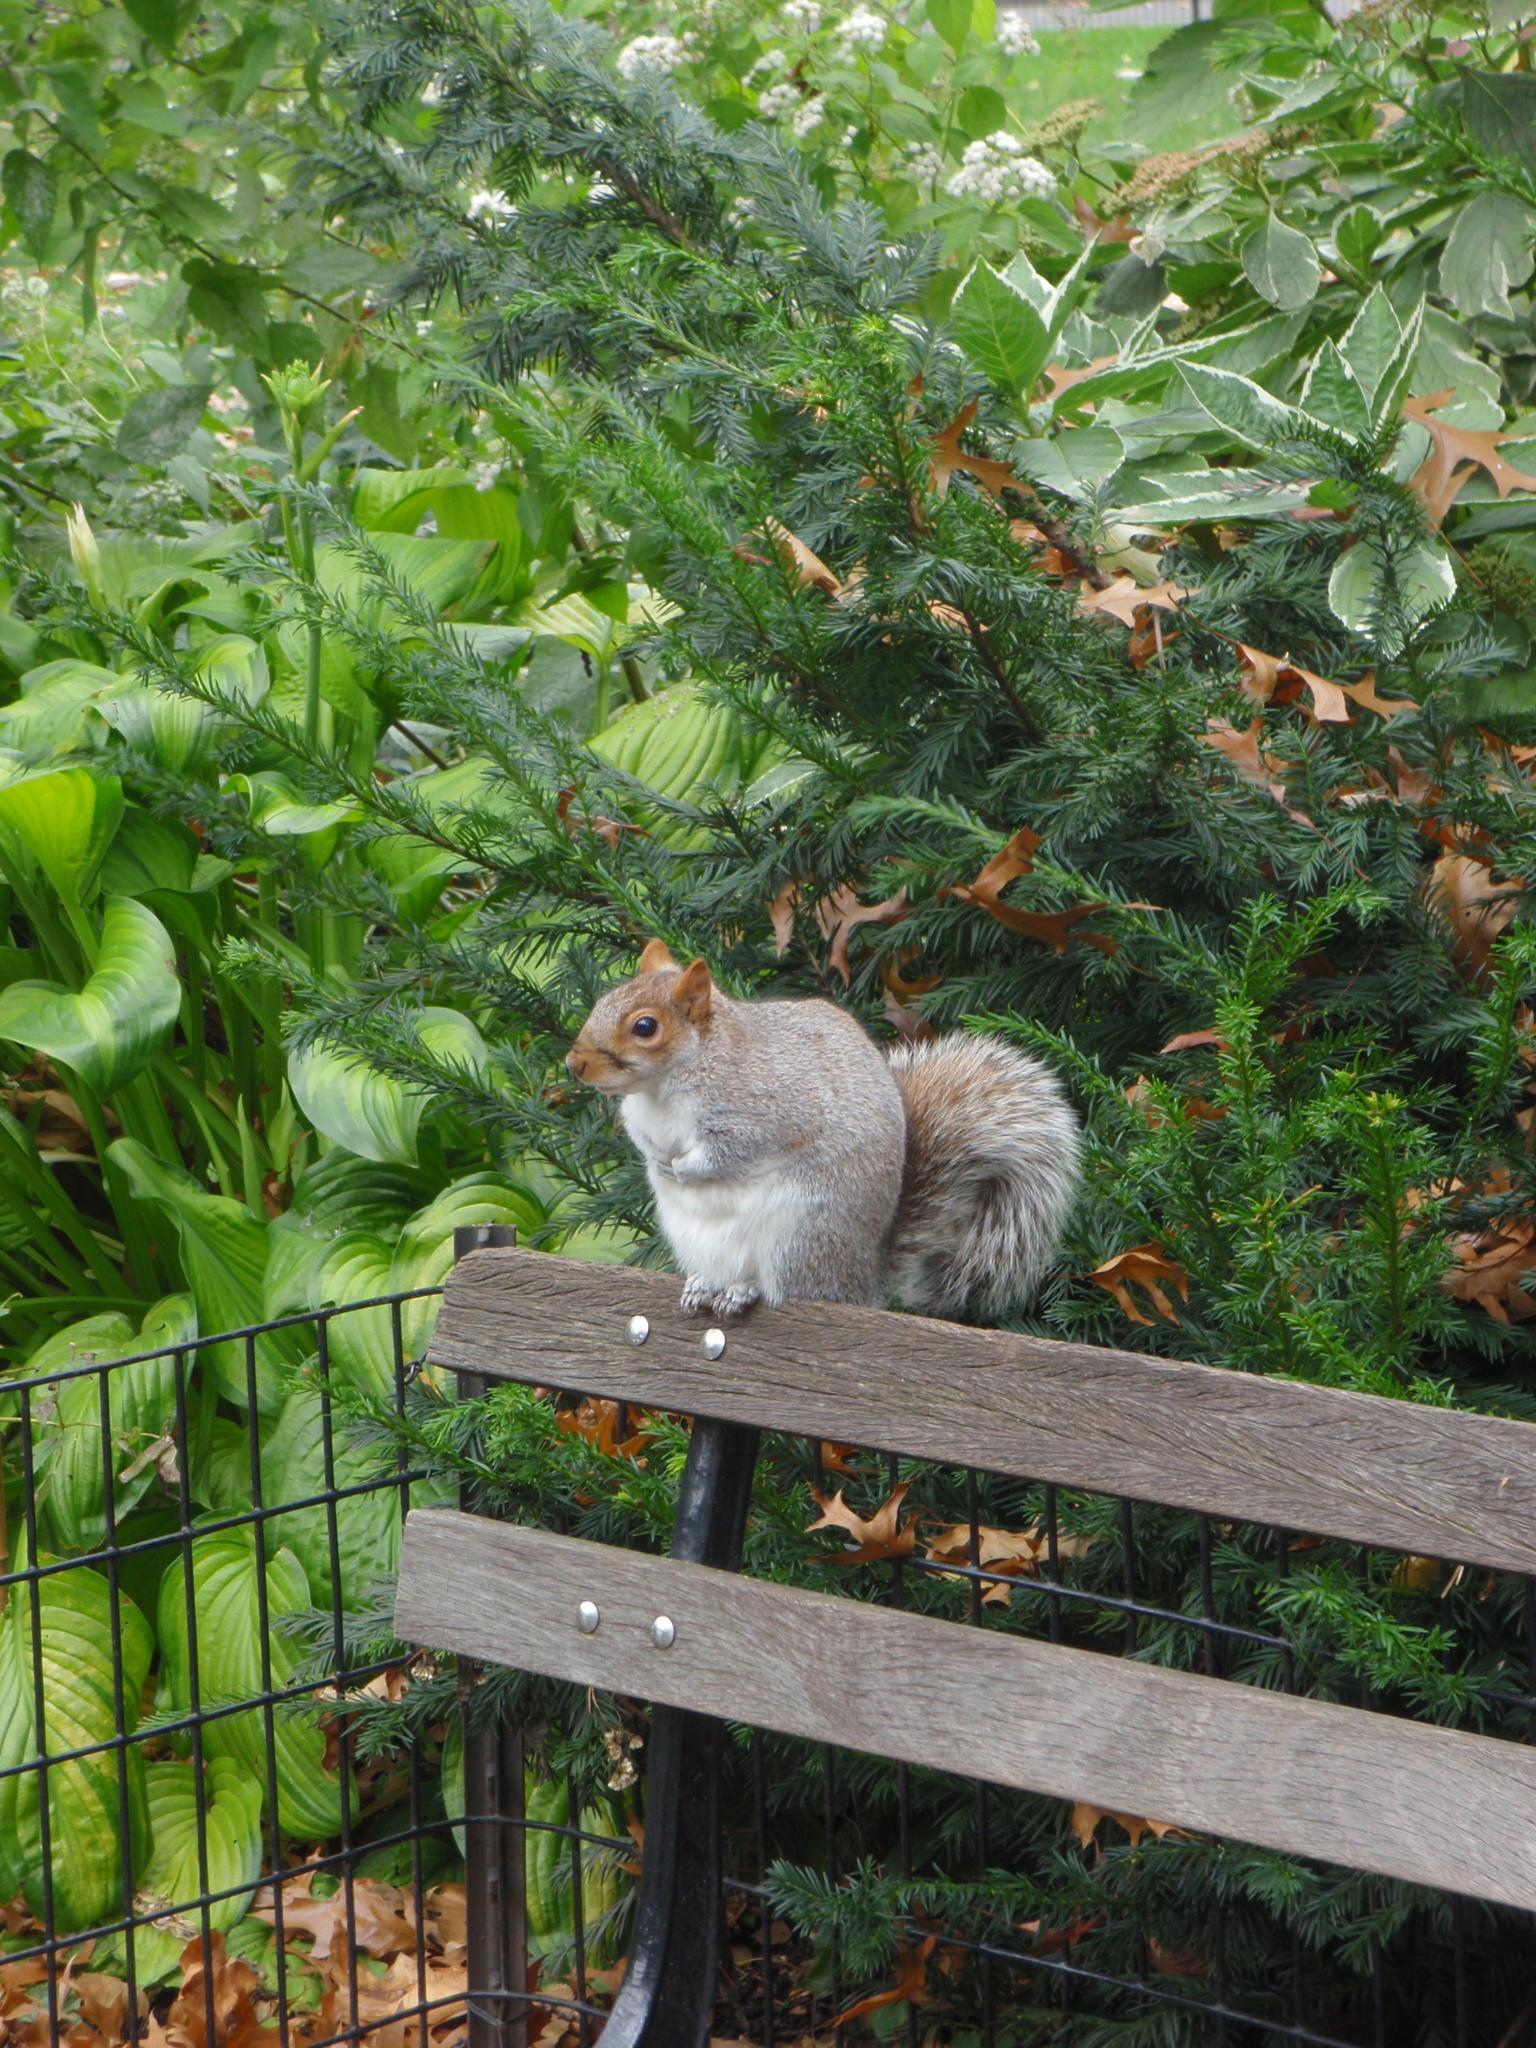 Squirrel by Isabel Gonzalez Martil